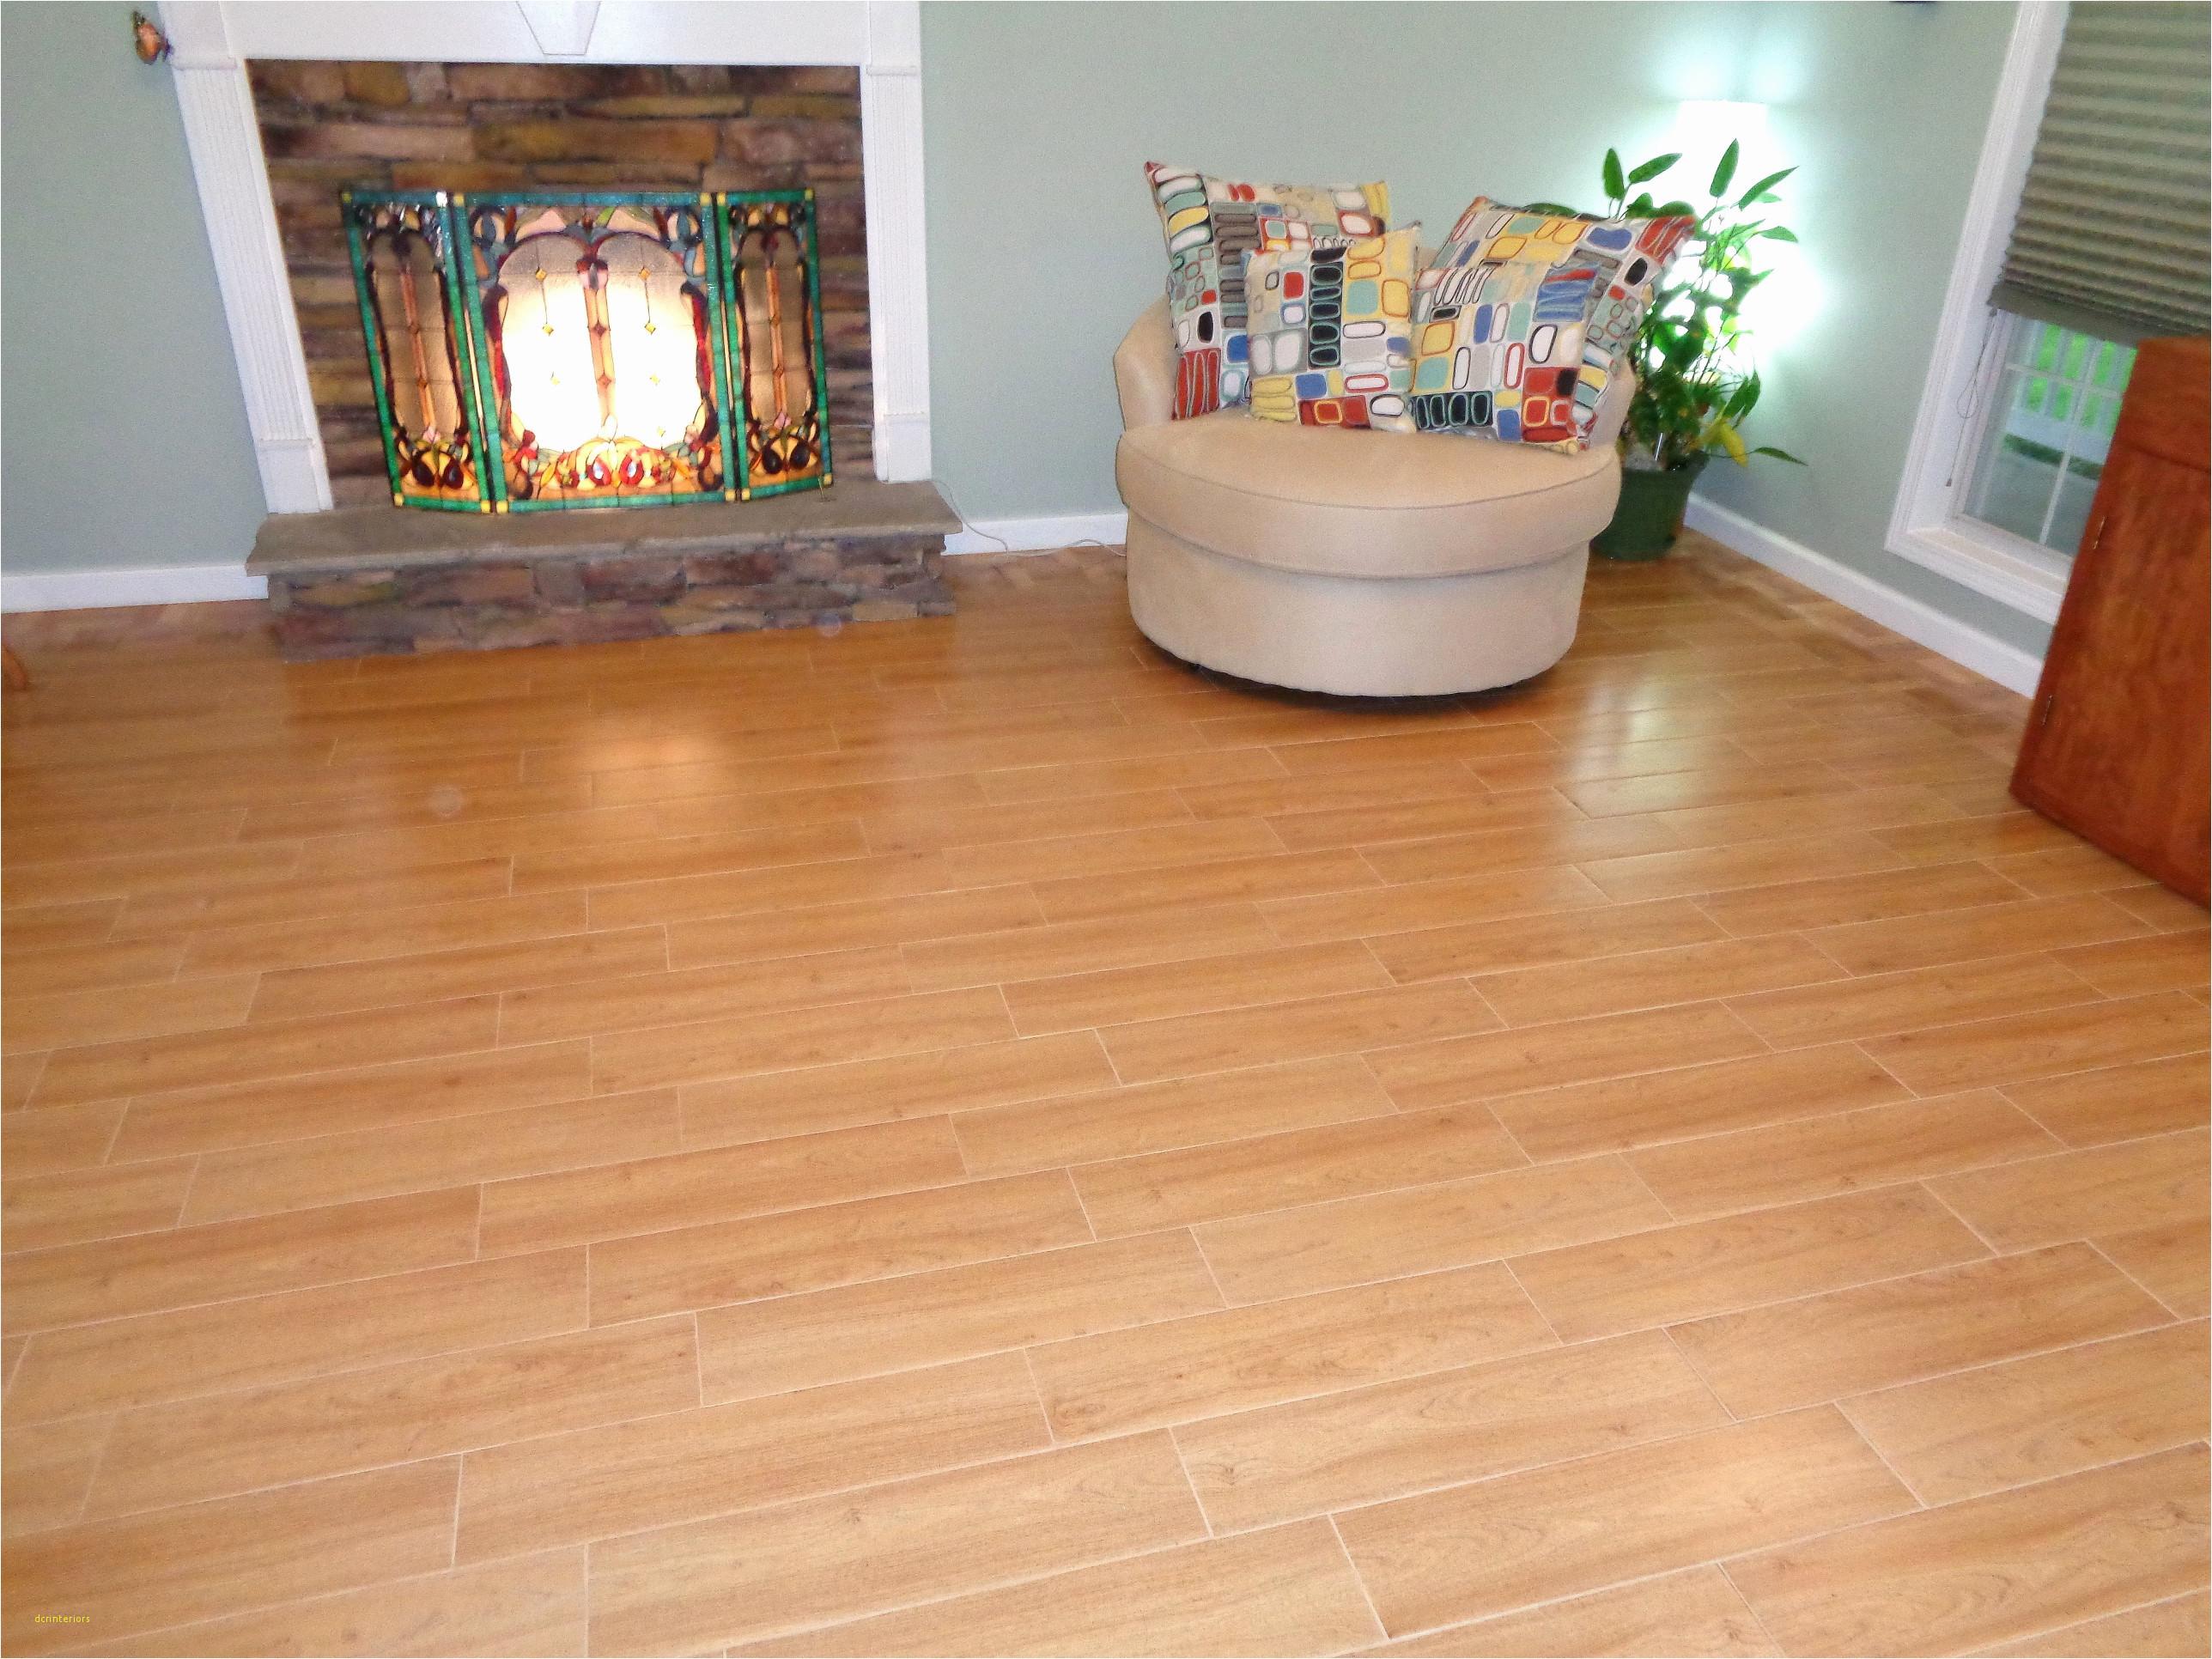 is bamboo hardwood flooring good of lovely bamboo hardwood flooring home design regarding 29 amazing laminate flooring ideas what is bamboo flooring inspirational